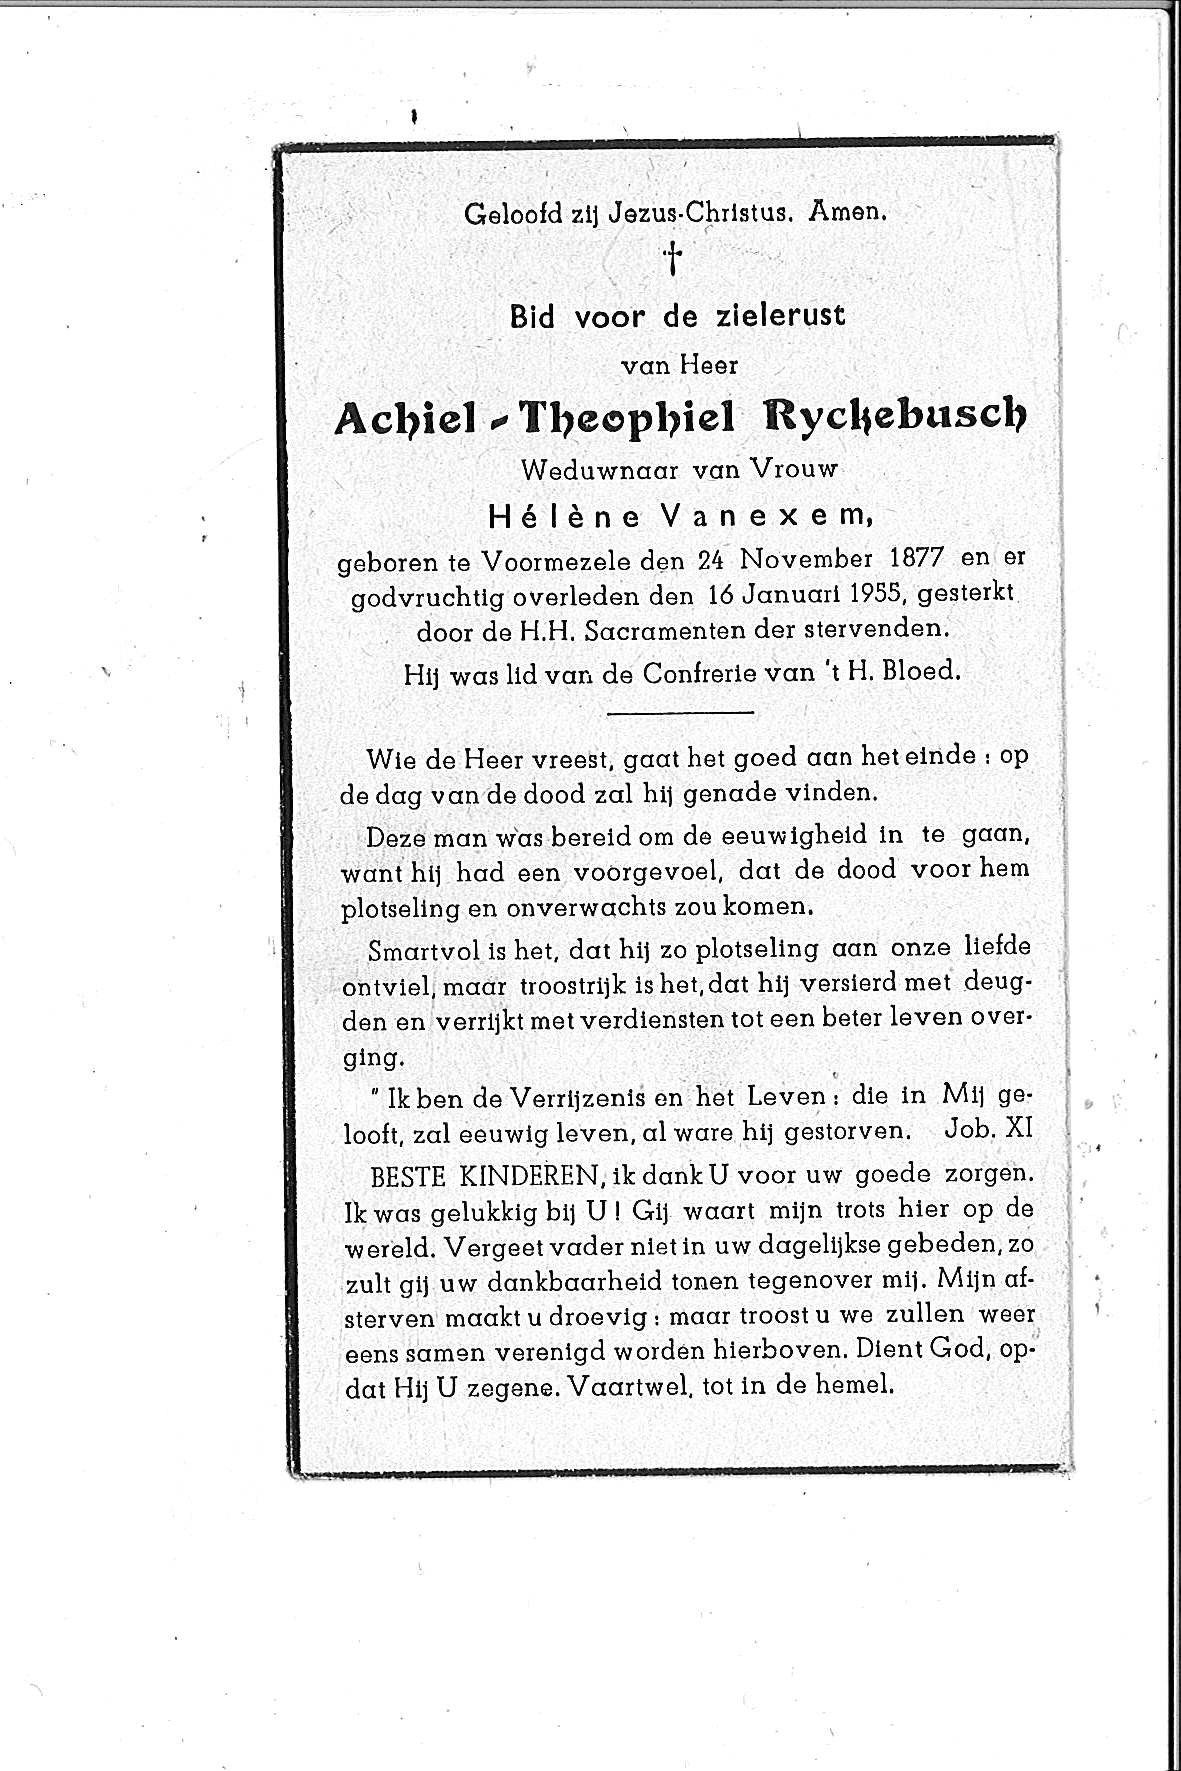 Achiel-Theophiel(1955)20150114150809_00057.jpg